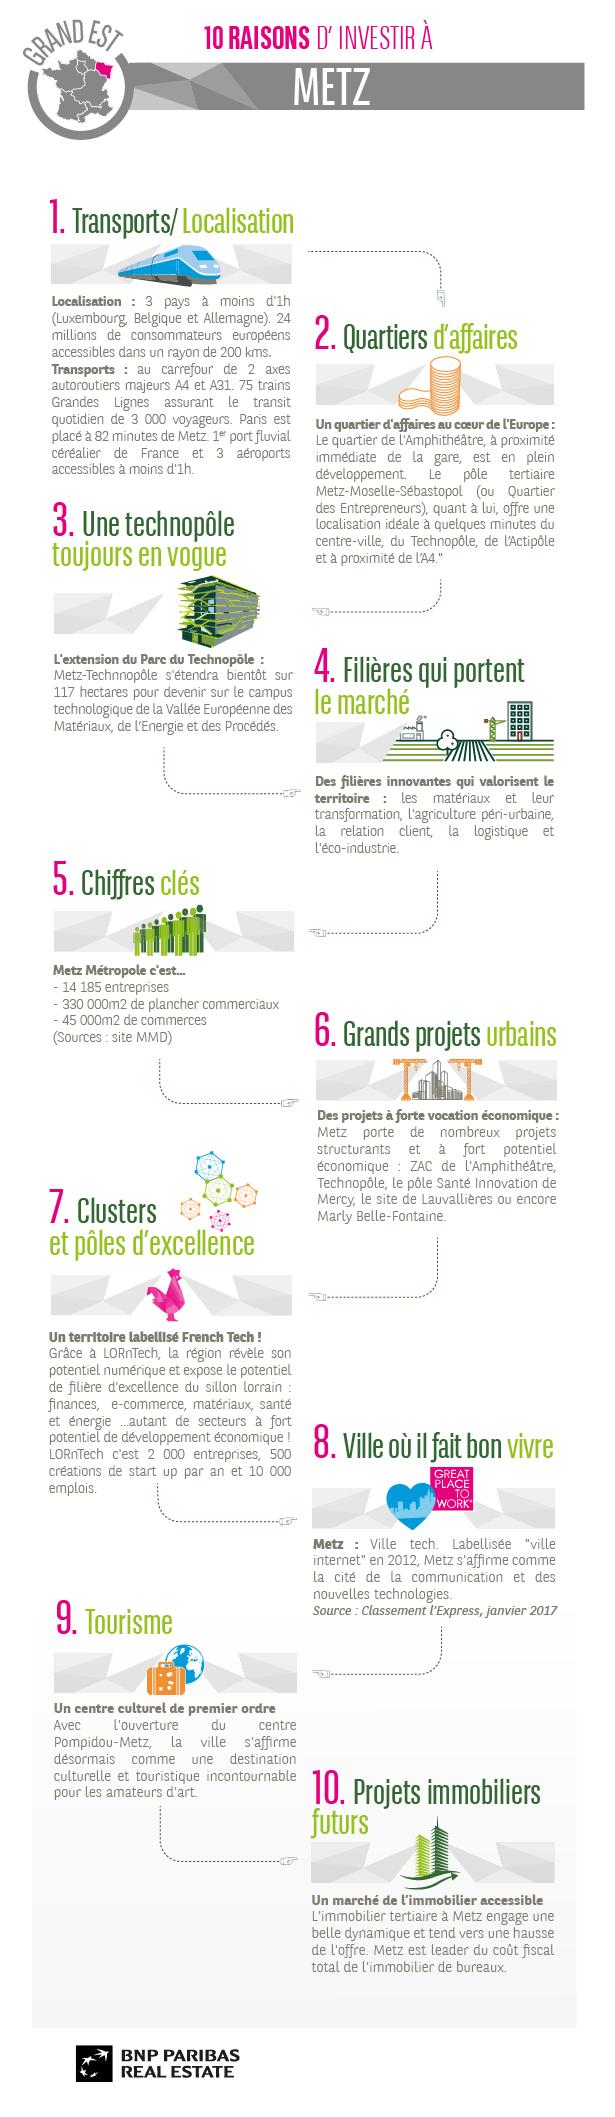 Infographie : 10 raisons d'investir à Metz